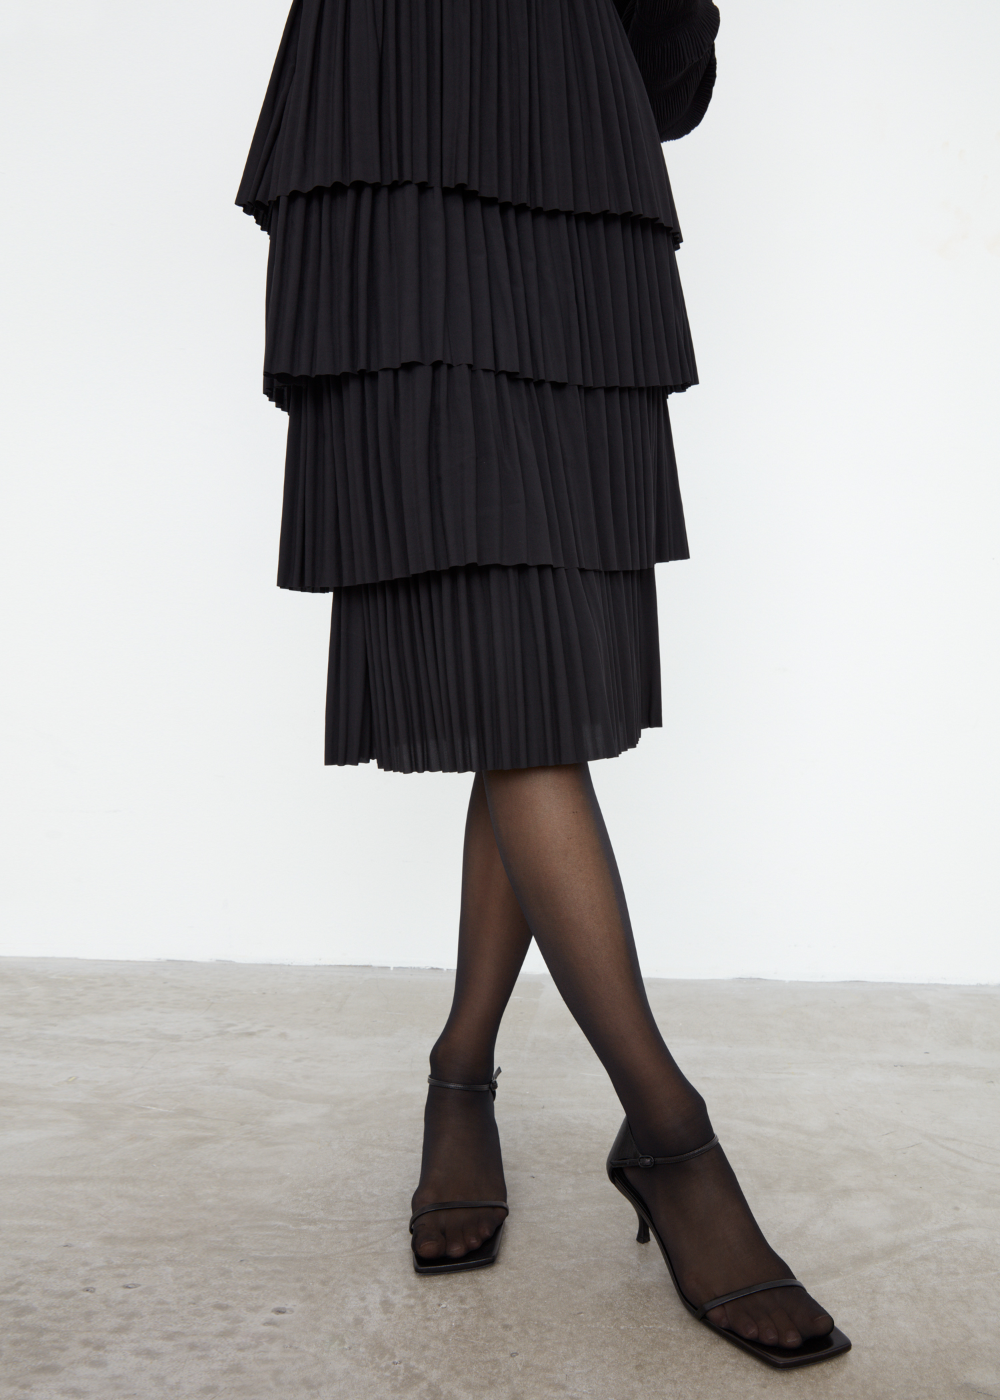 Dresses Skirts Dress Skirt Fashion Dresses [ 1400 x 1000 Pixel ]